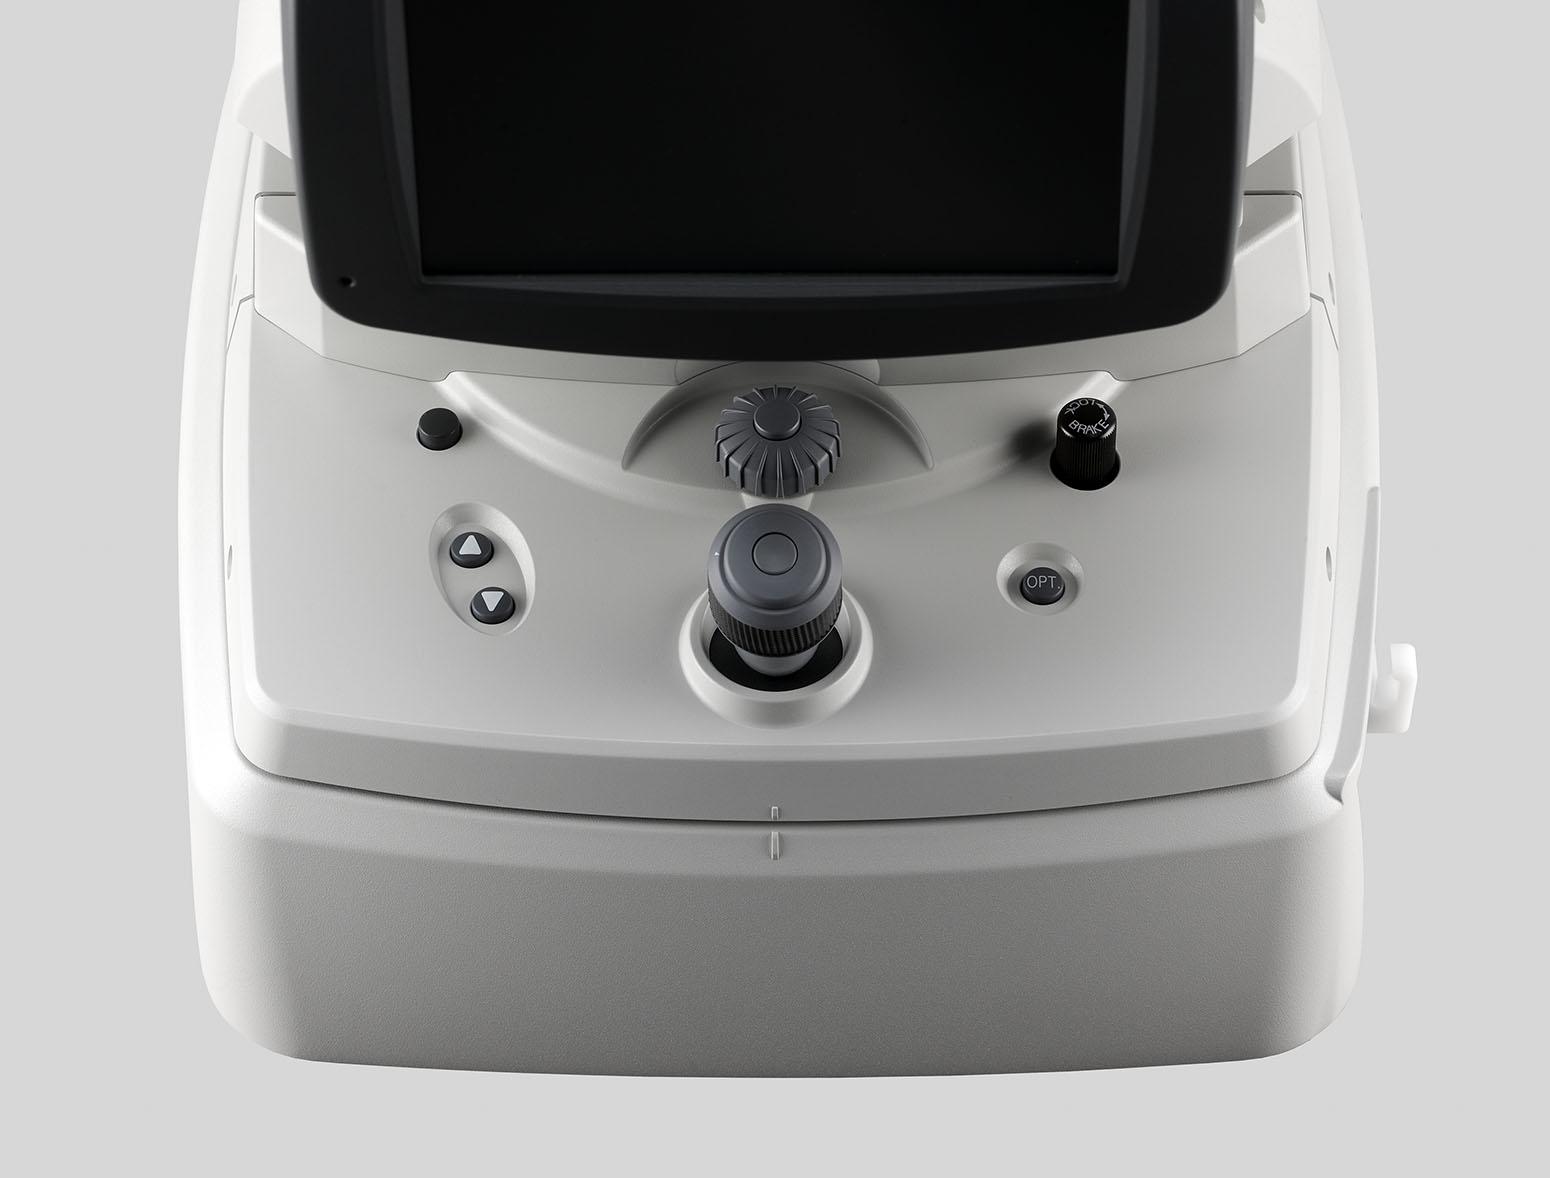 https://www.lameris-group.nl/wp-content/uploads/2020/03/Nidek-Optical-Coherence-Tomography-Retina-Scan-Duo-RS-330-4.jpg